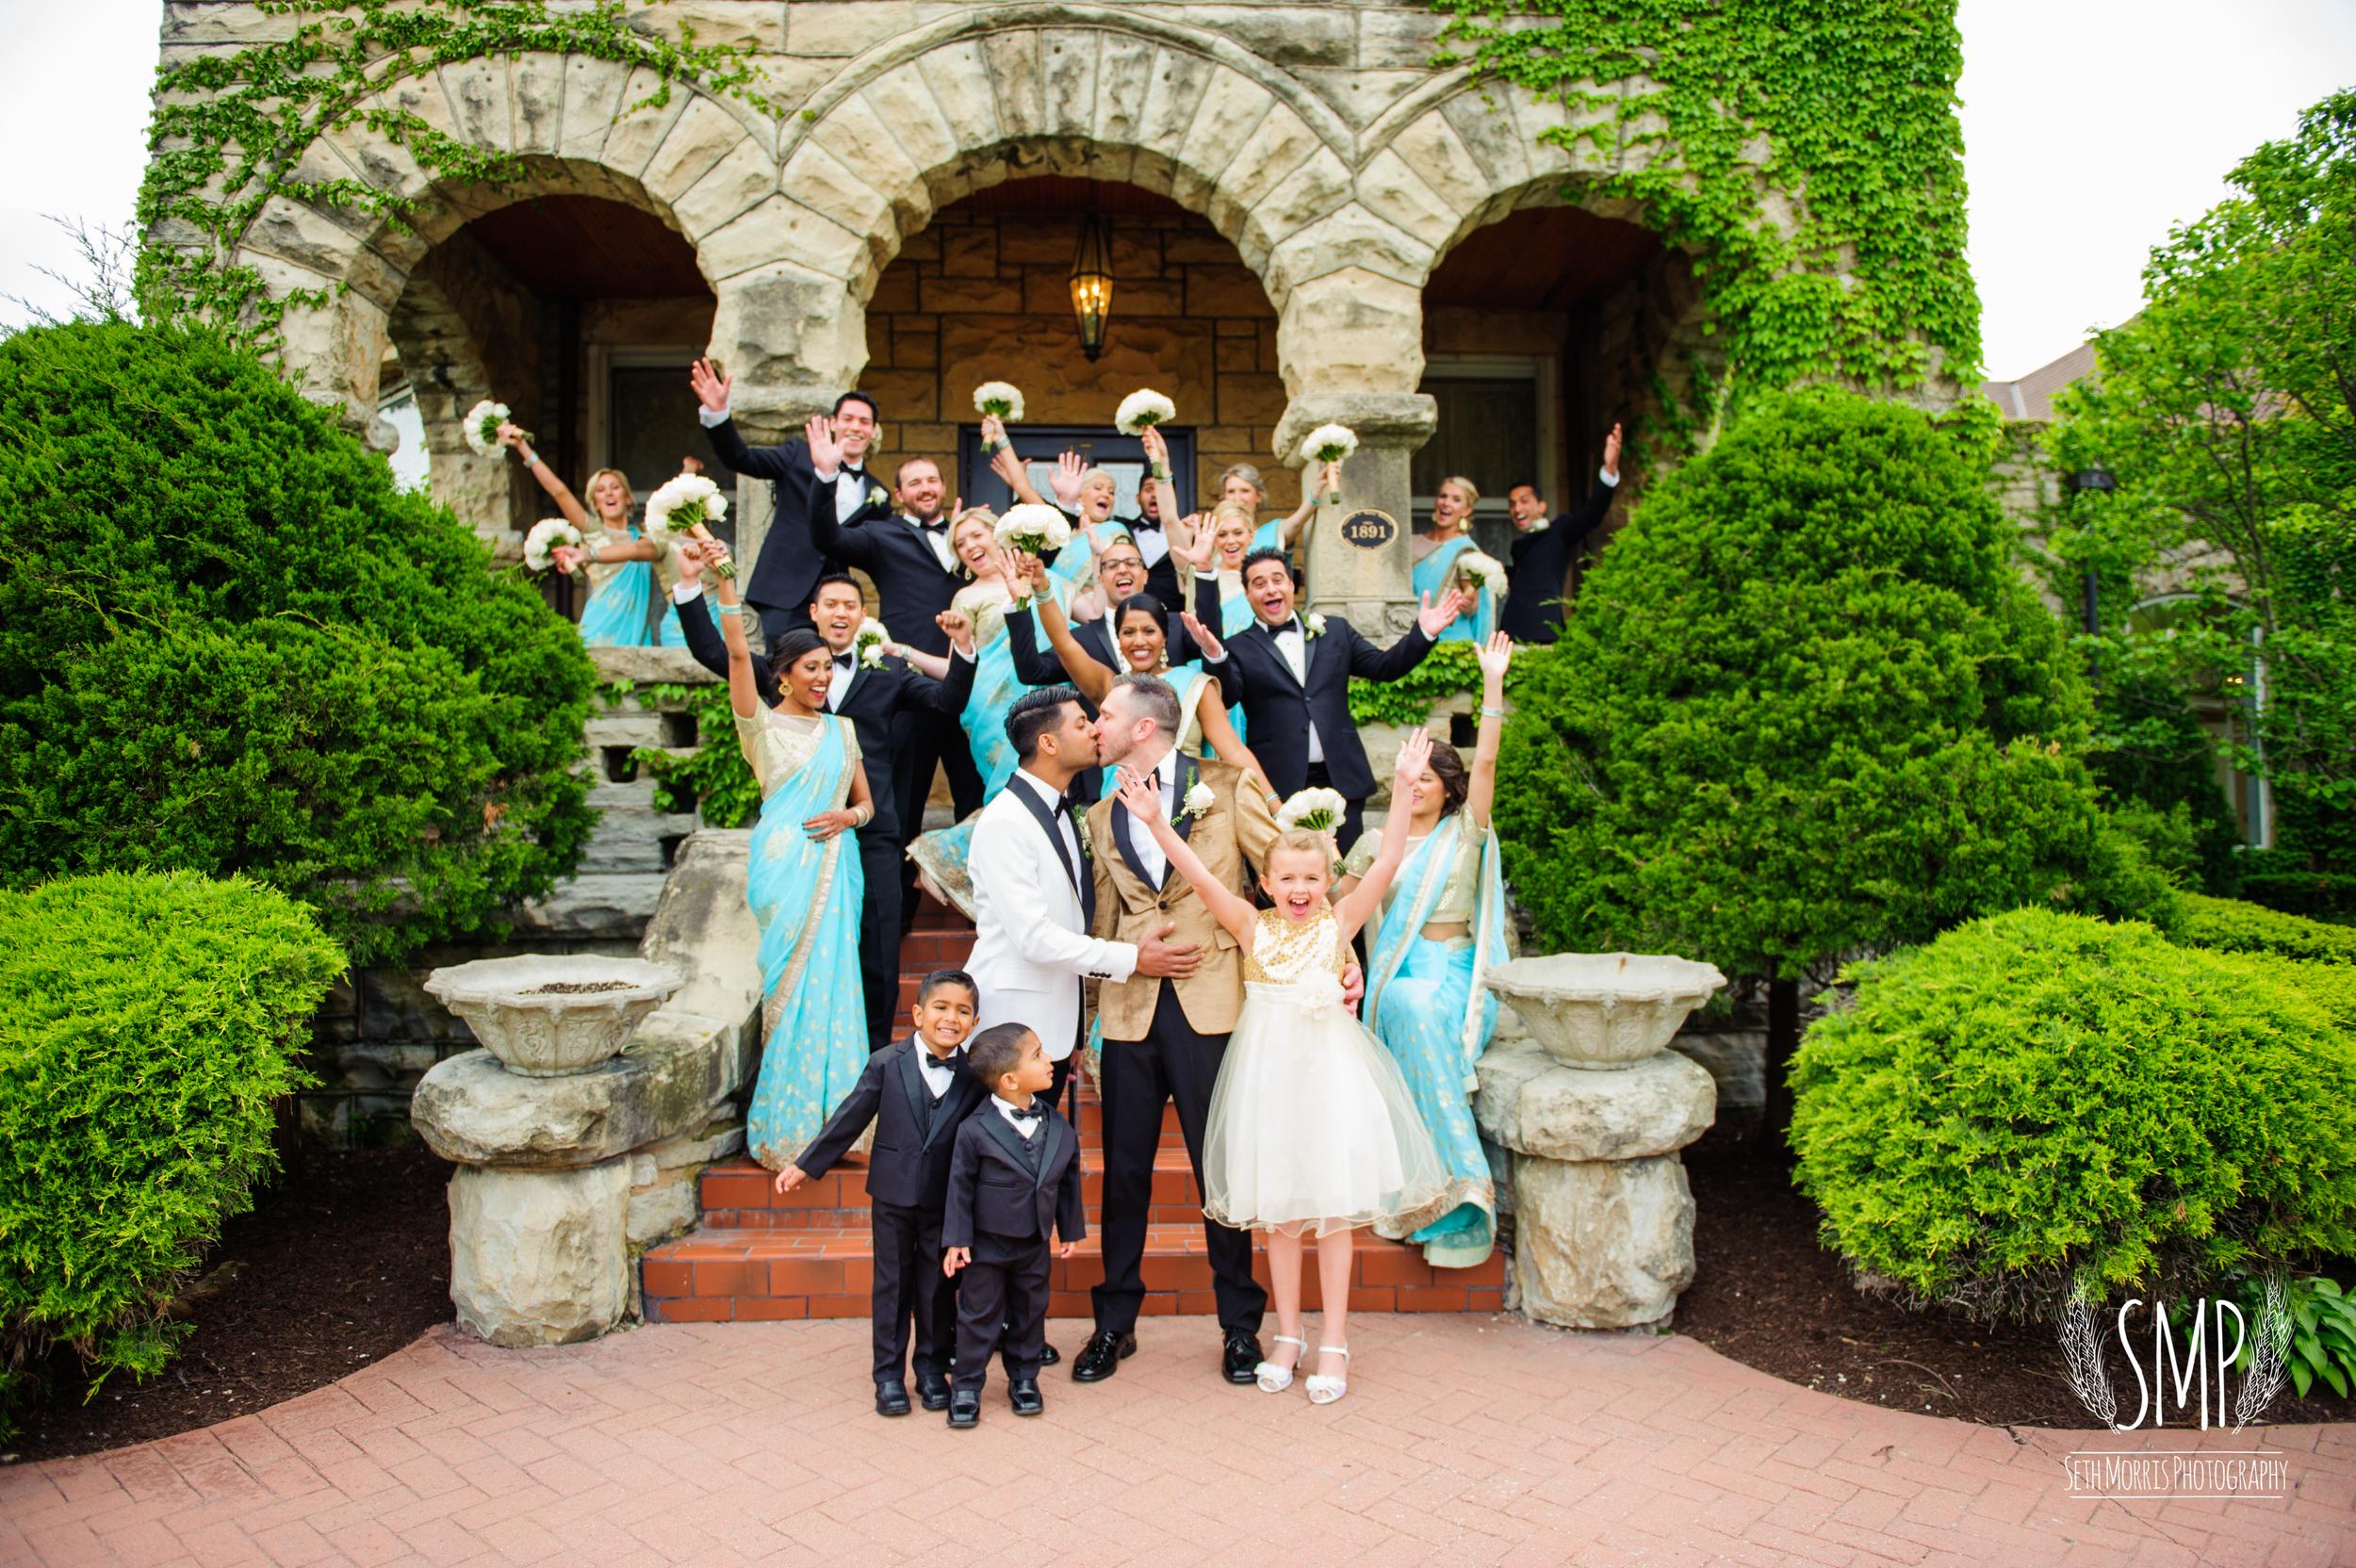 same-sex-wedding-photographer-chicago-illinois-53.jpg